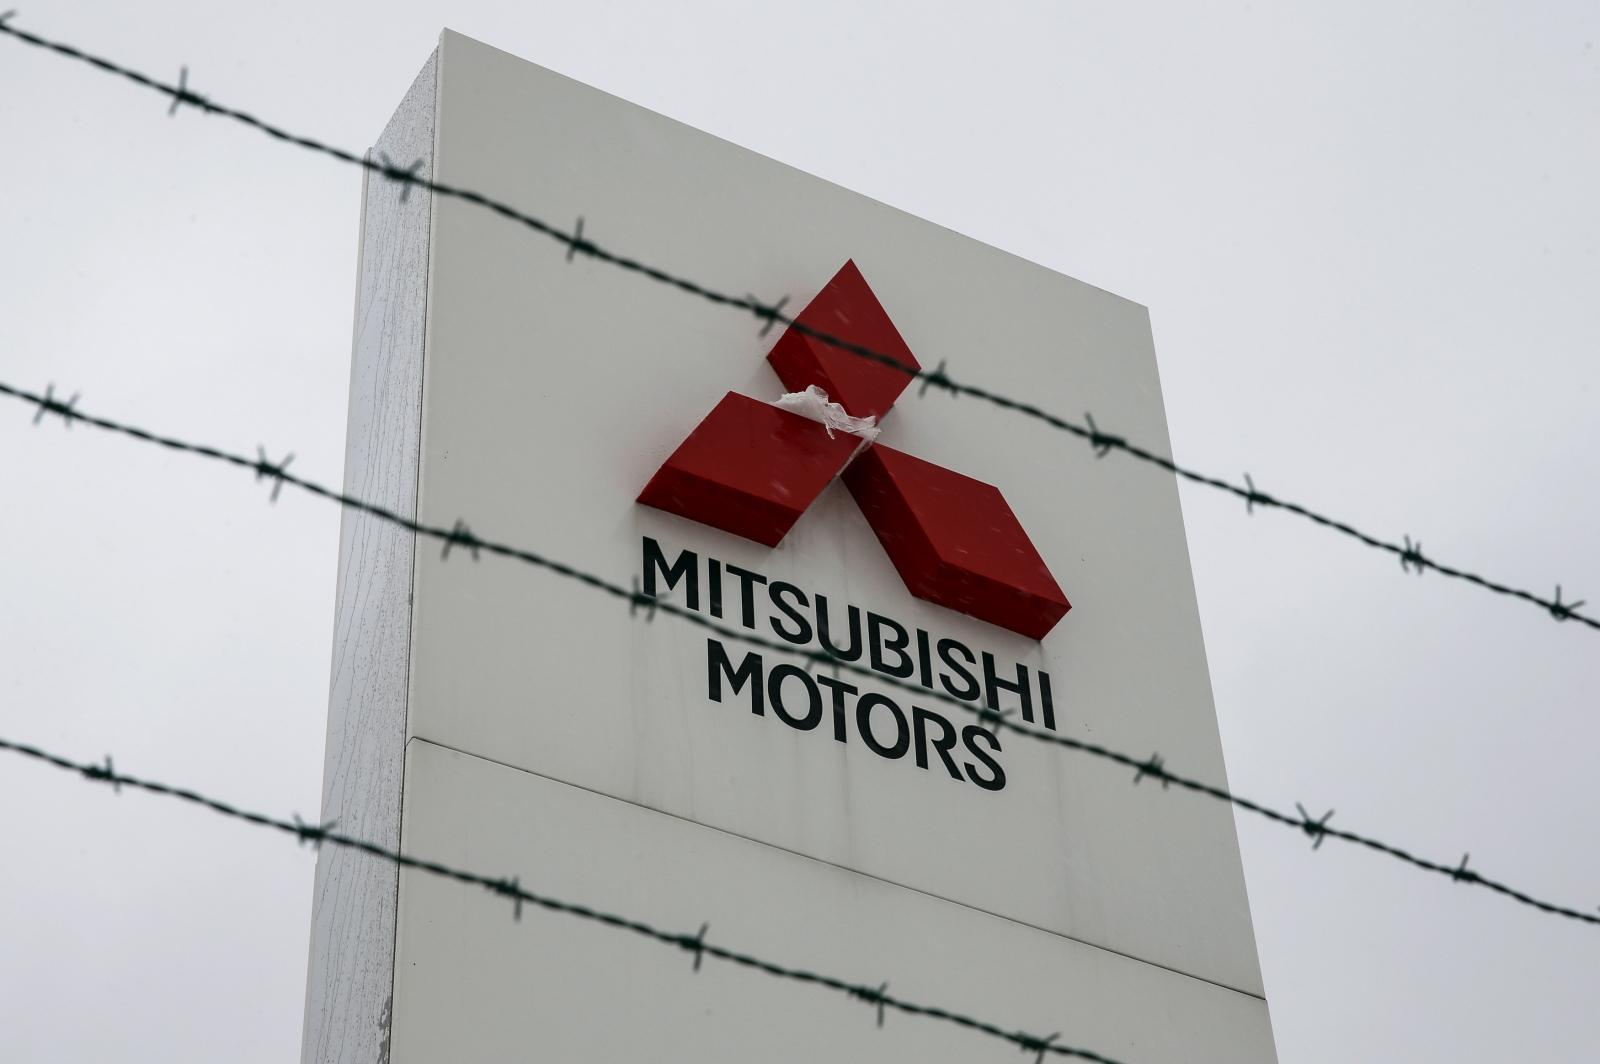 Mitsubishi-gian-lận-khí-thải